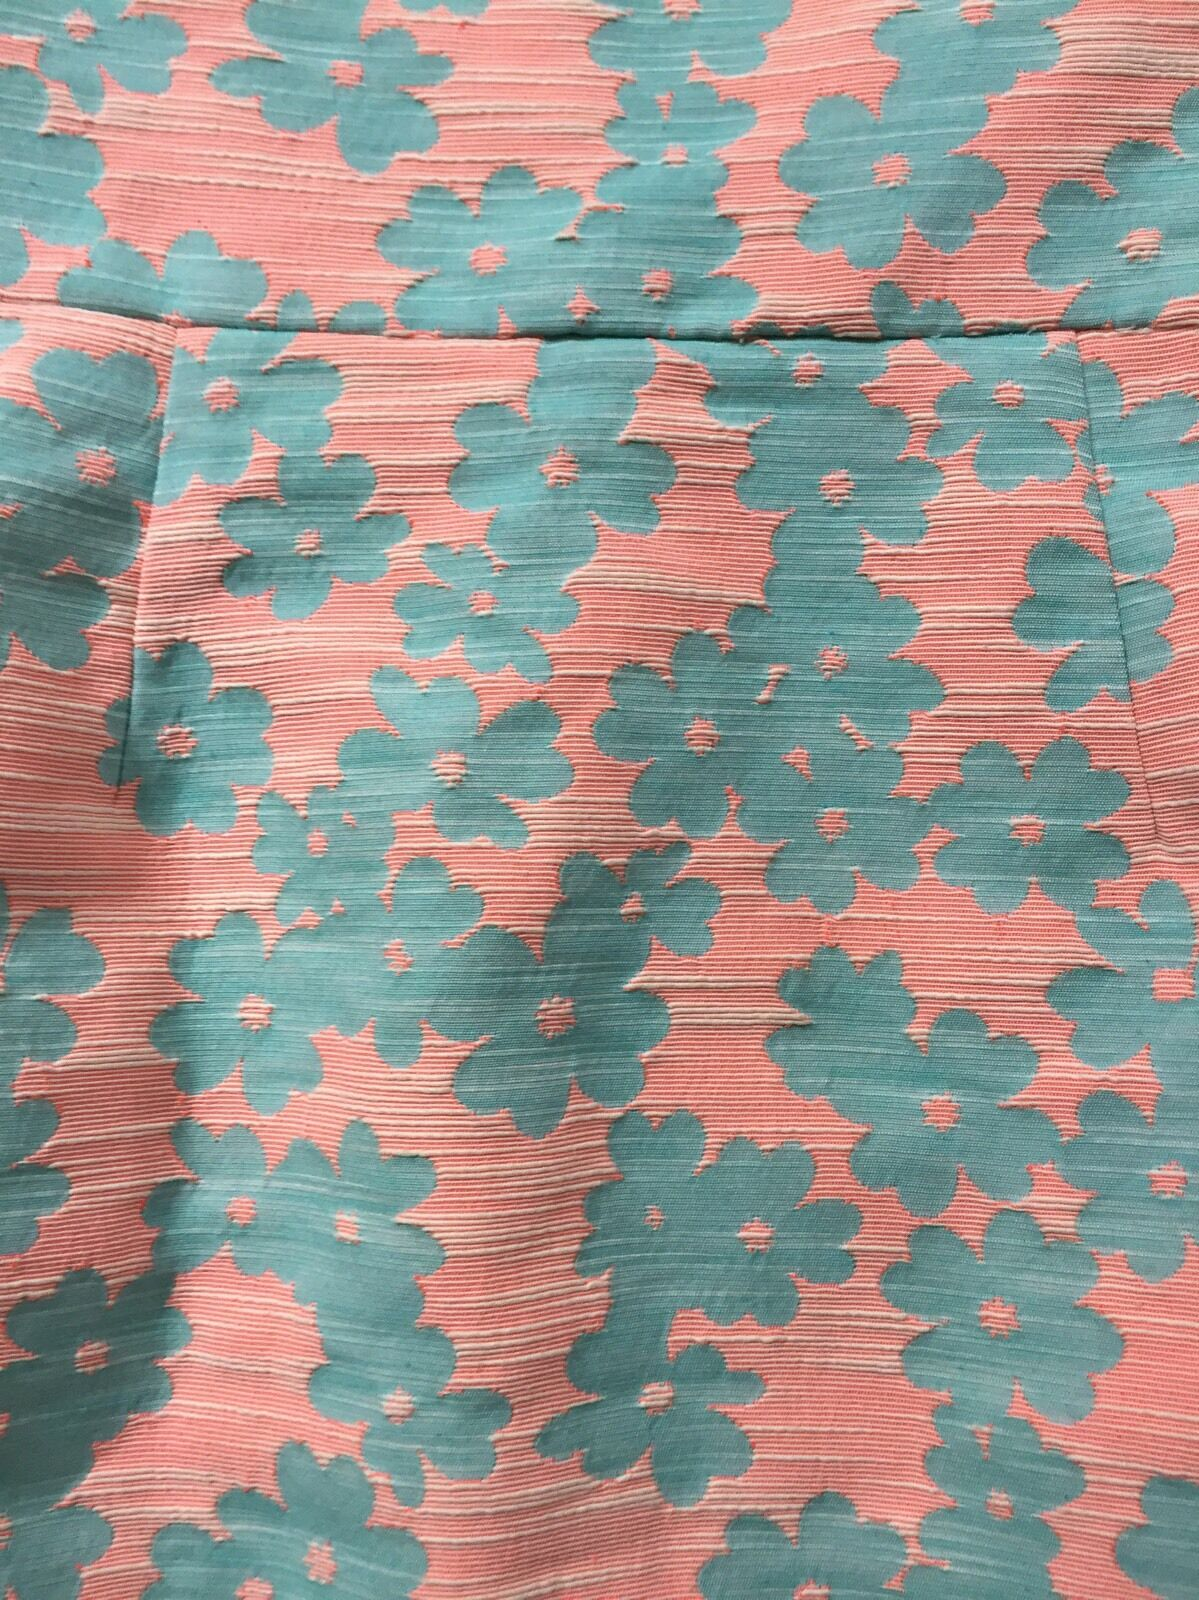 NWOT NWOT NWOT Anthropologie Hutch Pink Floral Sweetheart Strapless Dress Sz 2 Org.  286 e7d928